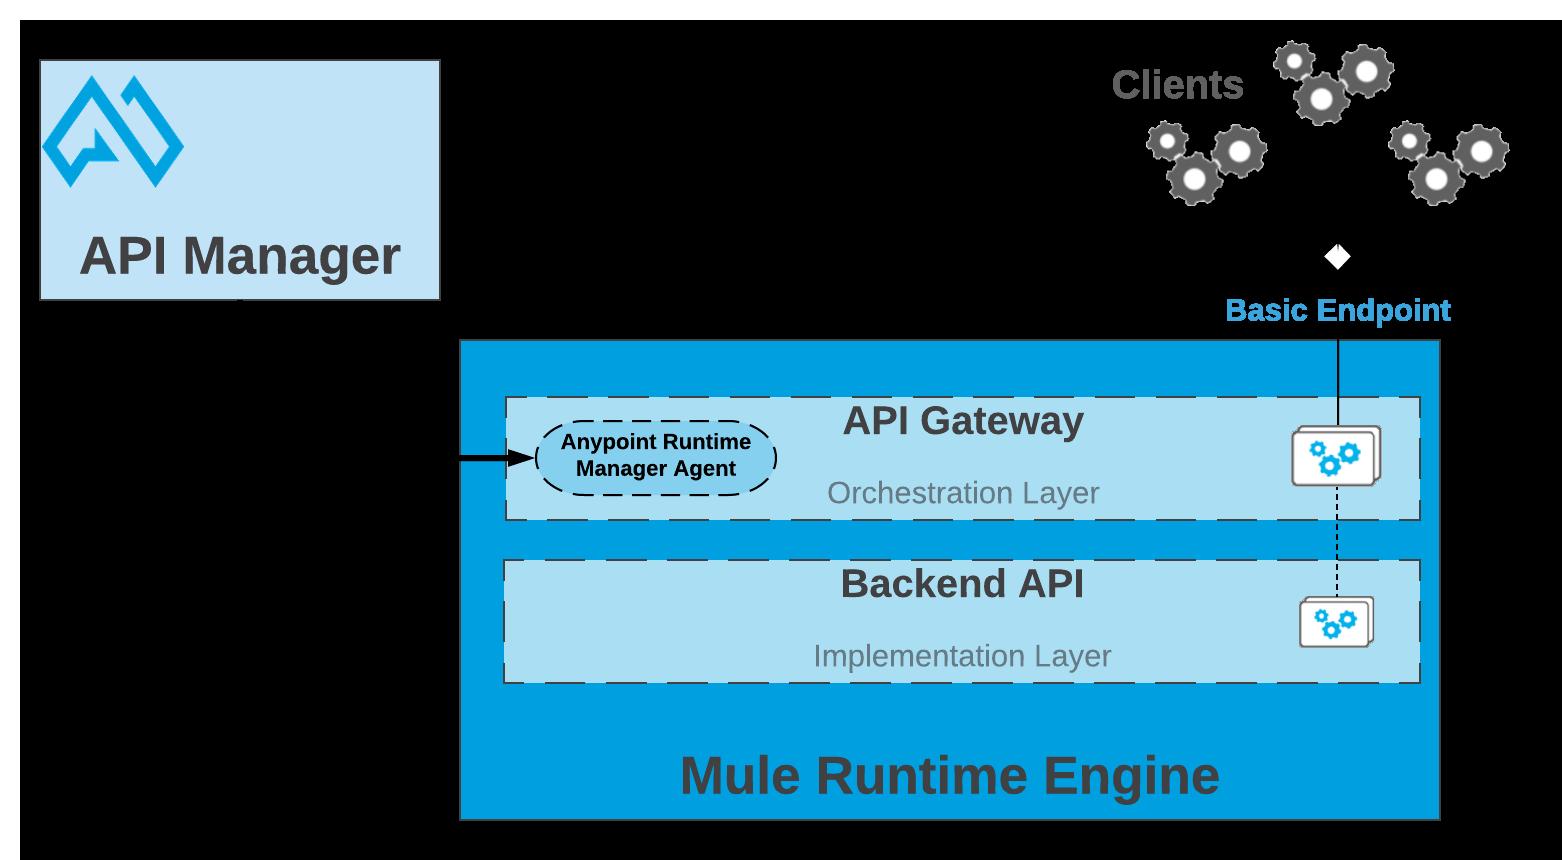 API Manager workflow